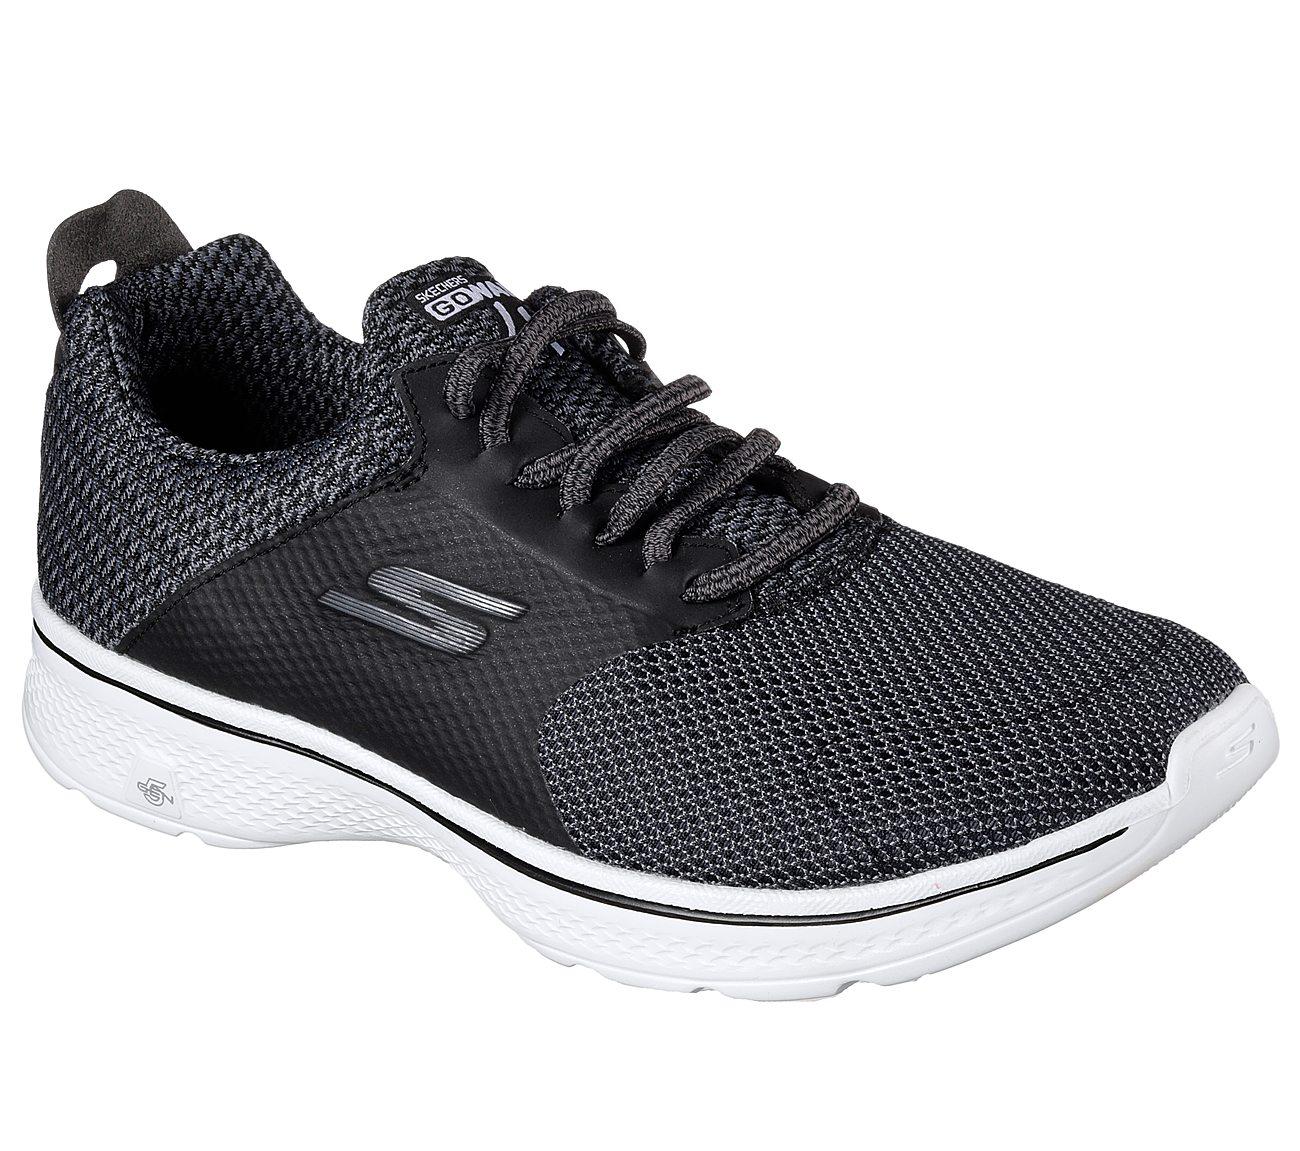 Skechers Mens go walk 4 Instinct Walking Shoes